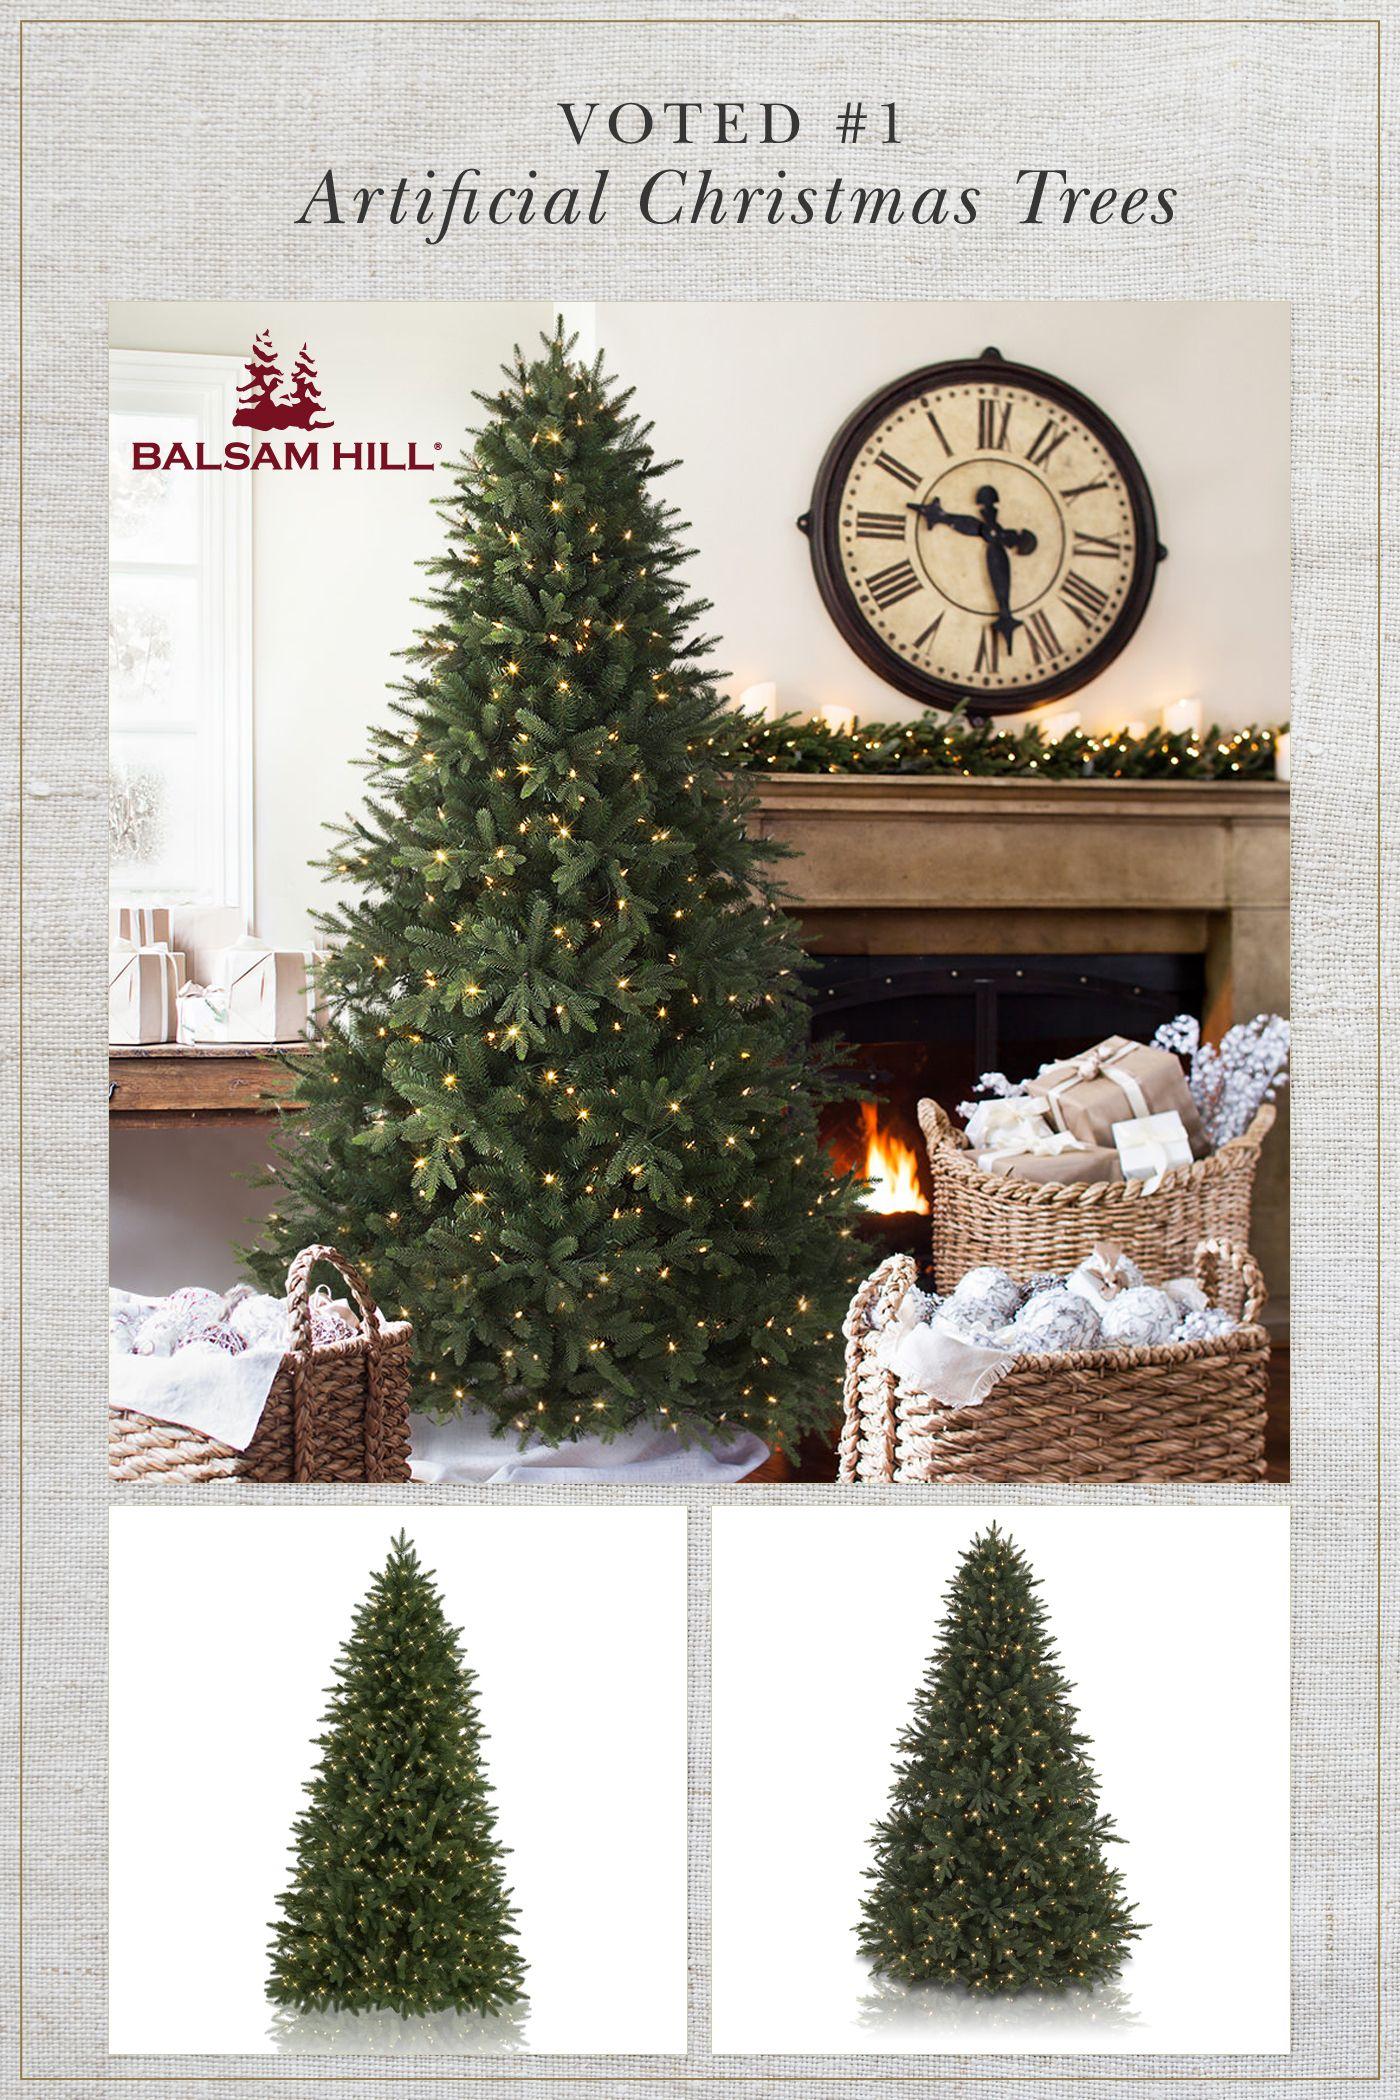 Balsam Hills Saratoga Spruce & Calistoga Fir Artificial Christmas Trees